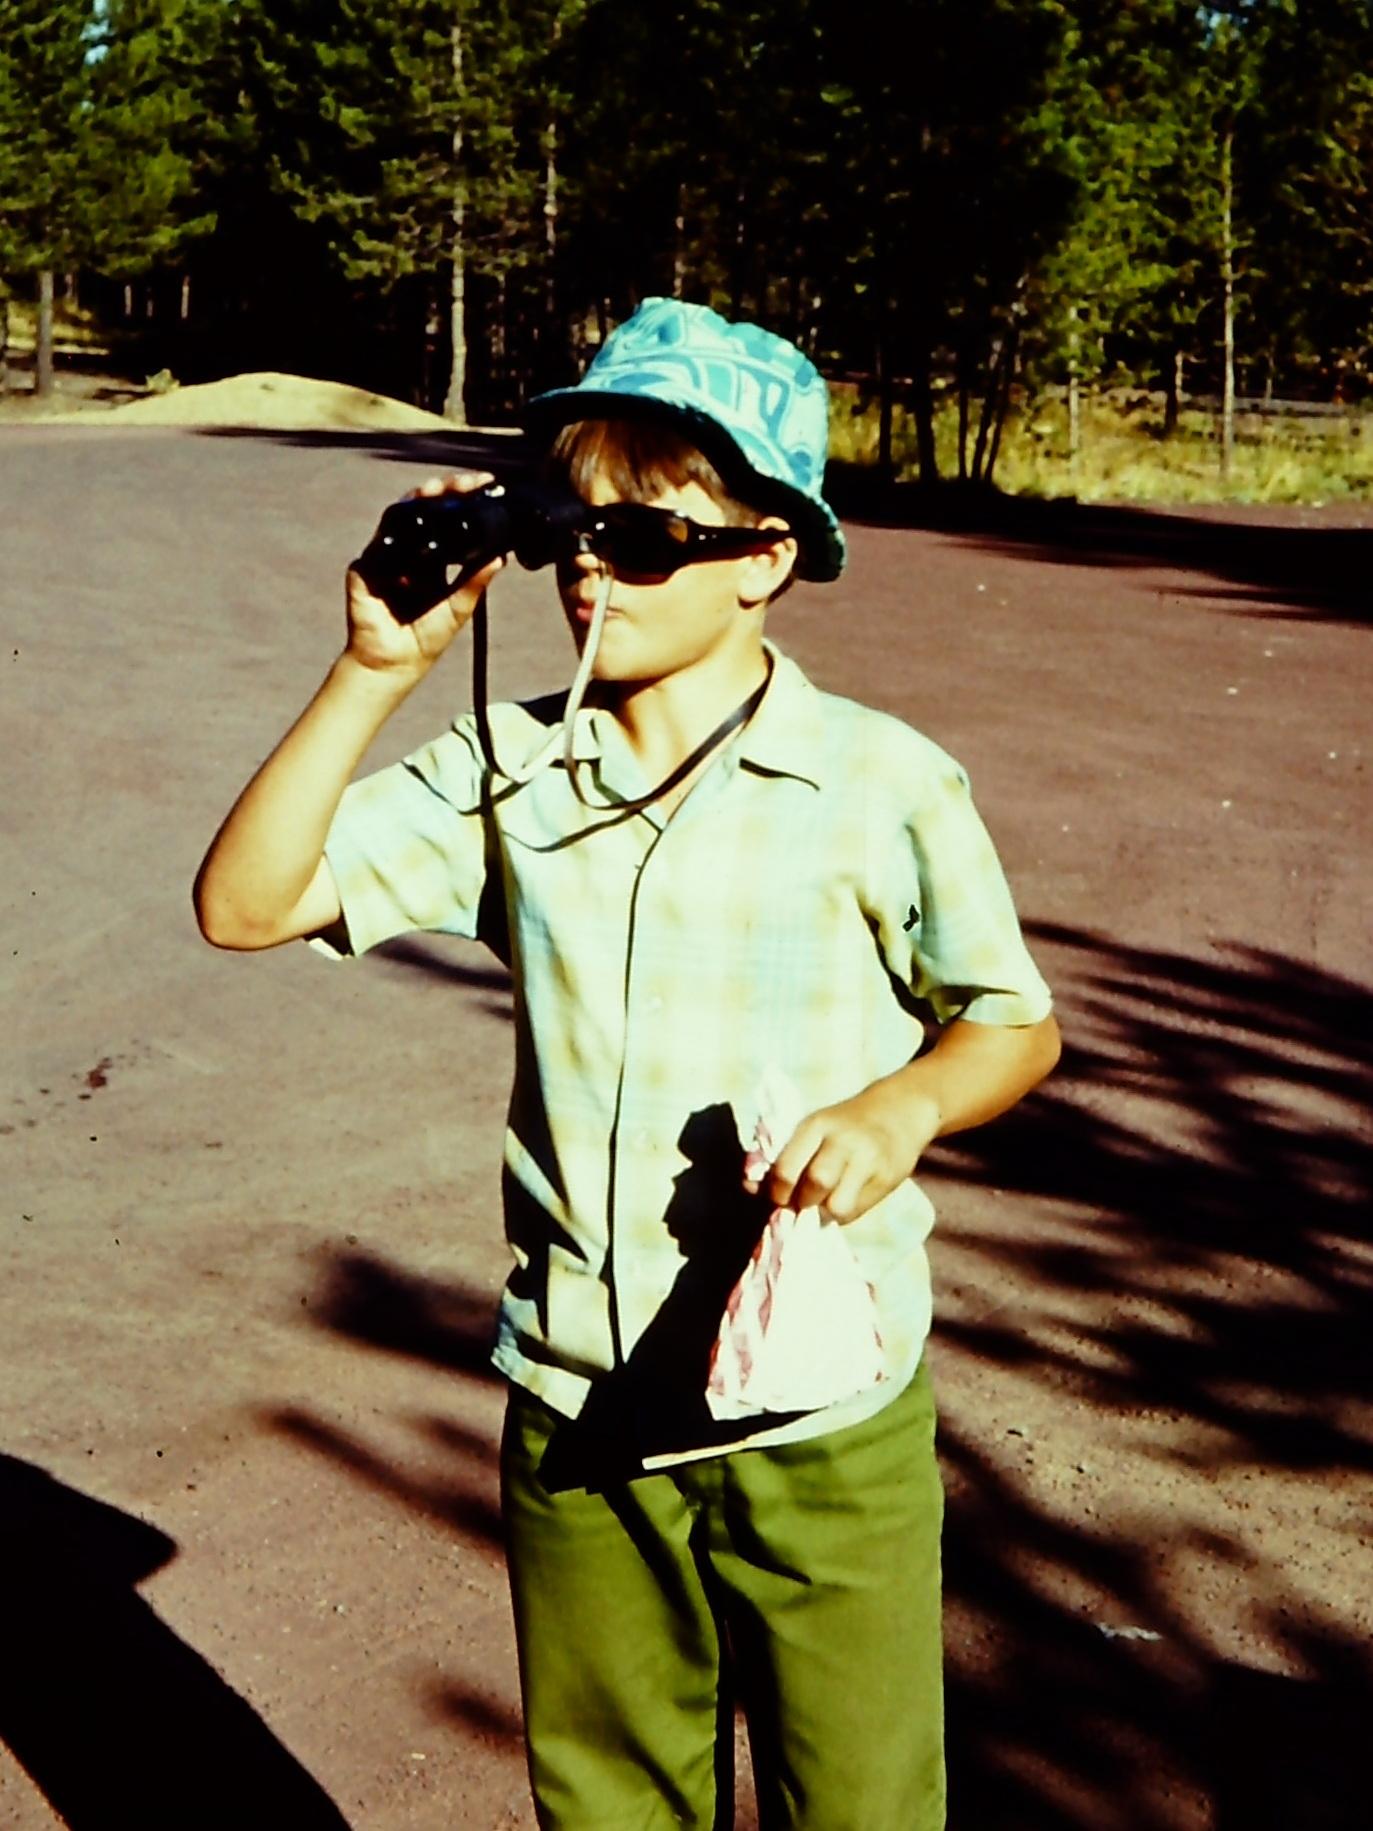 Paul - 1969 - age 10